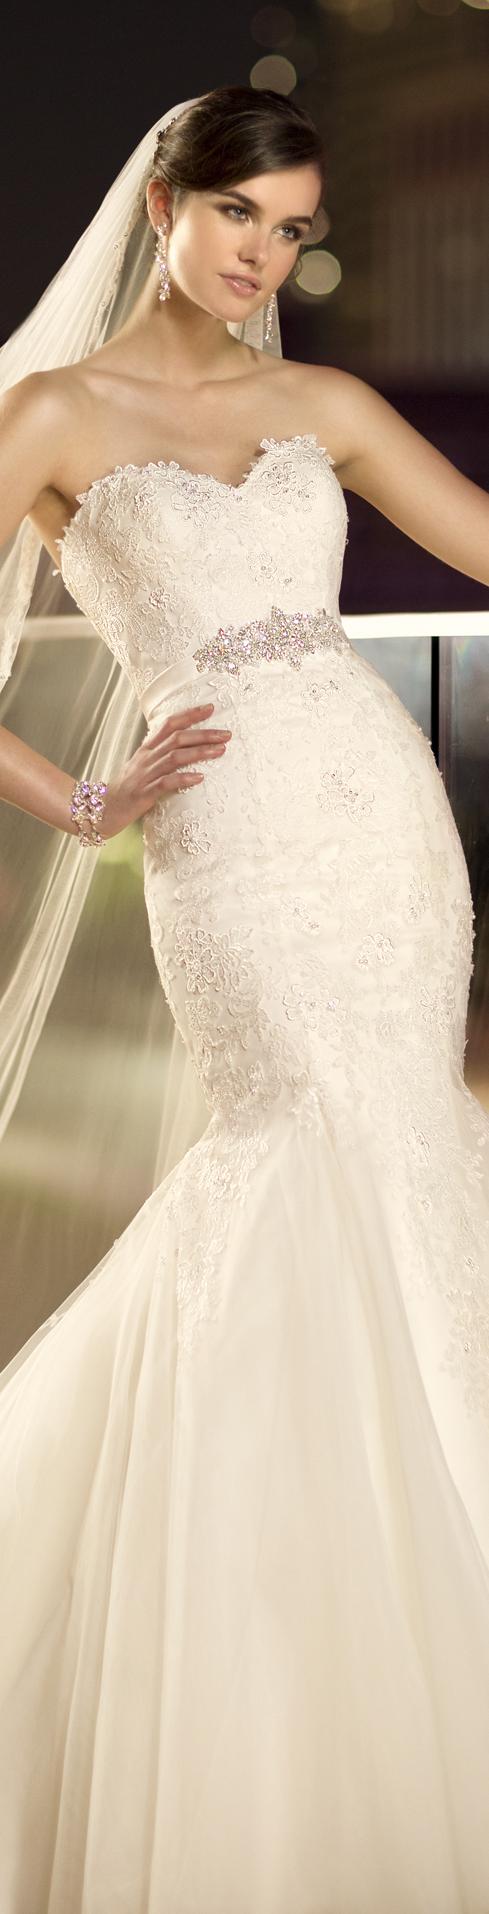 Essense wedding dress  Essense of Australia D bride wedding dress  The Bride